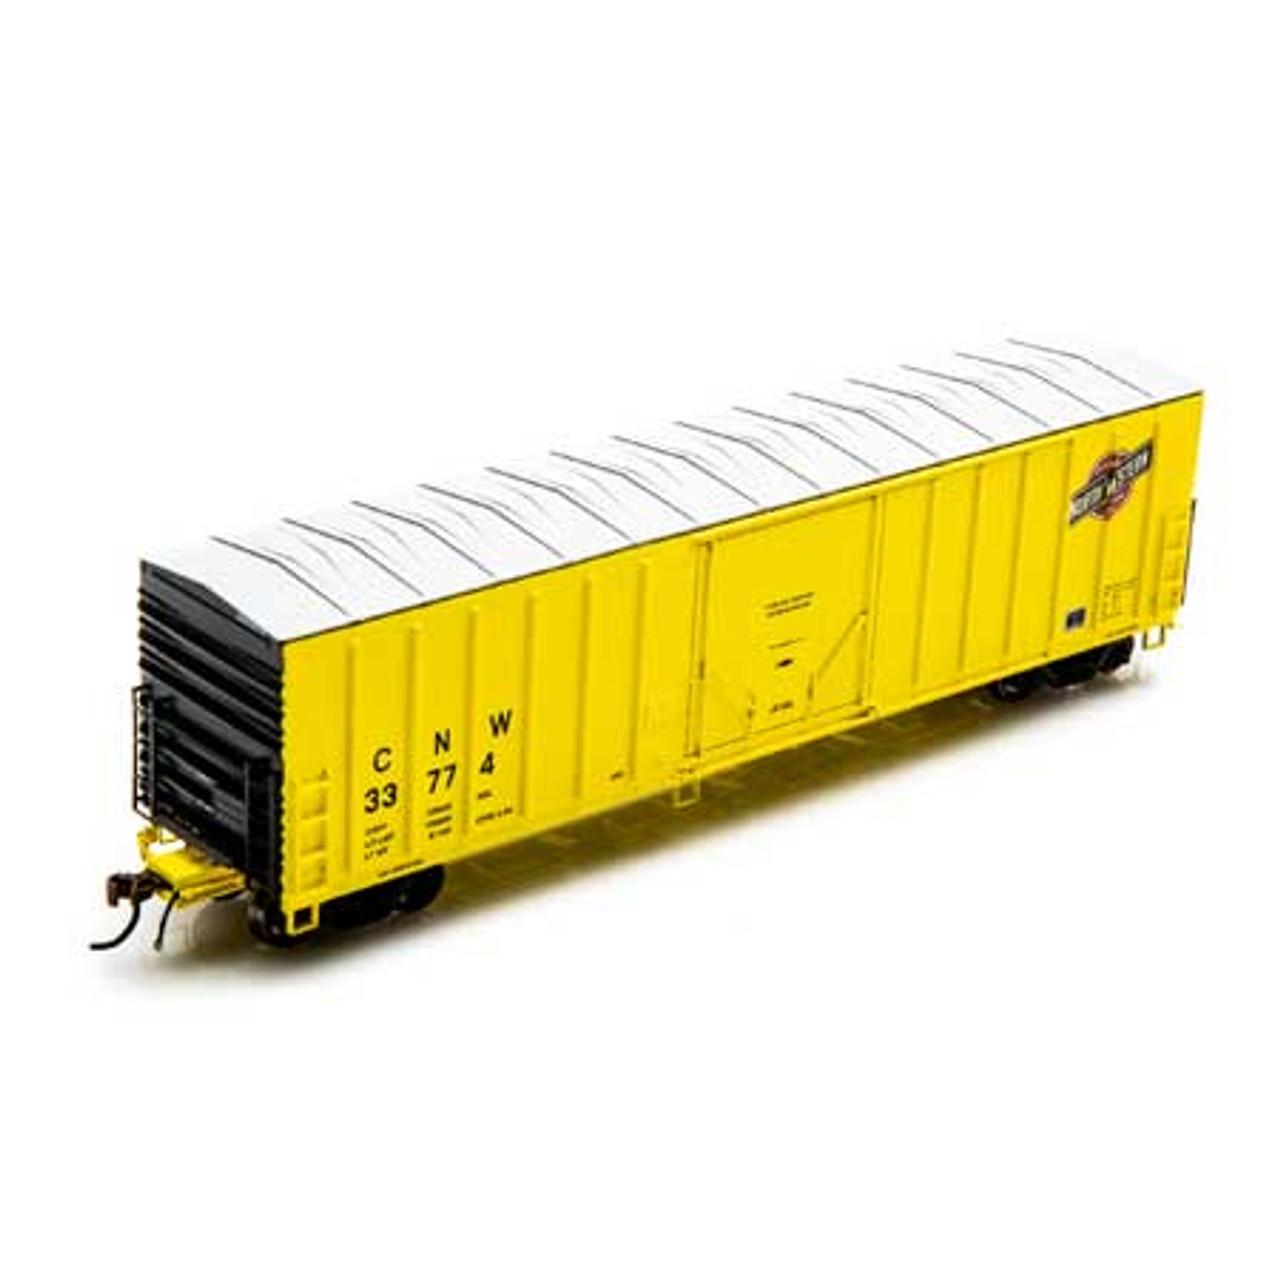 Athearn ATH2245 NACC 50' Box Car C&NW Chicago & North Western #33790  (Scale =N) Part #ATH2245